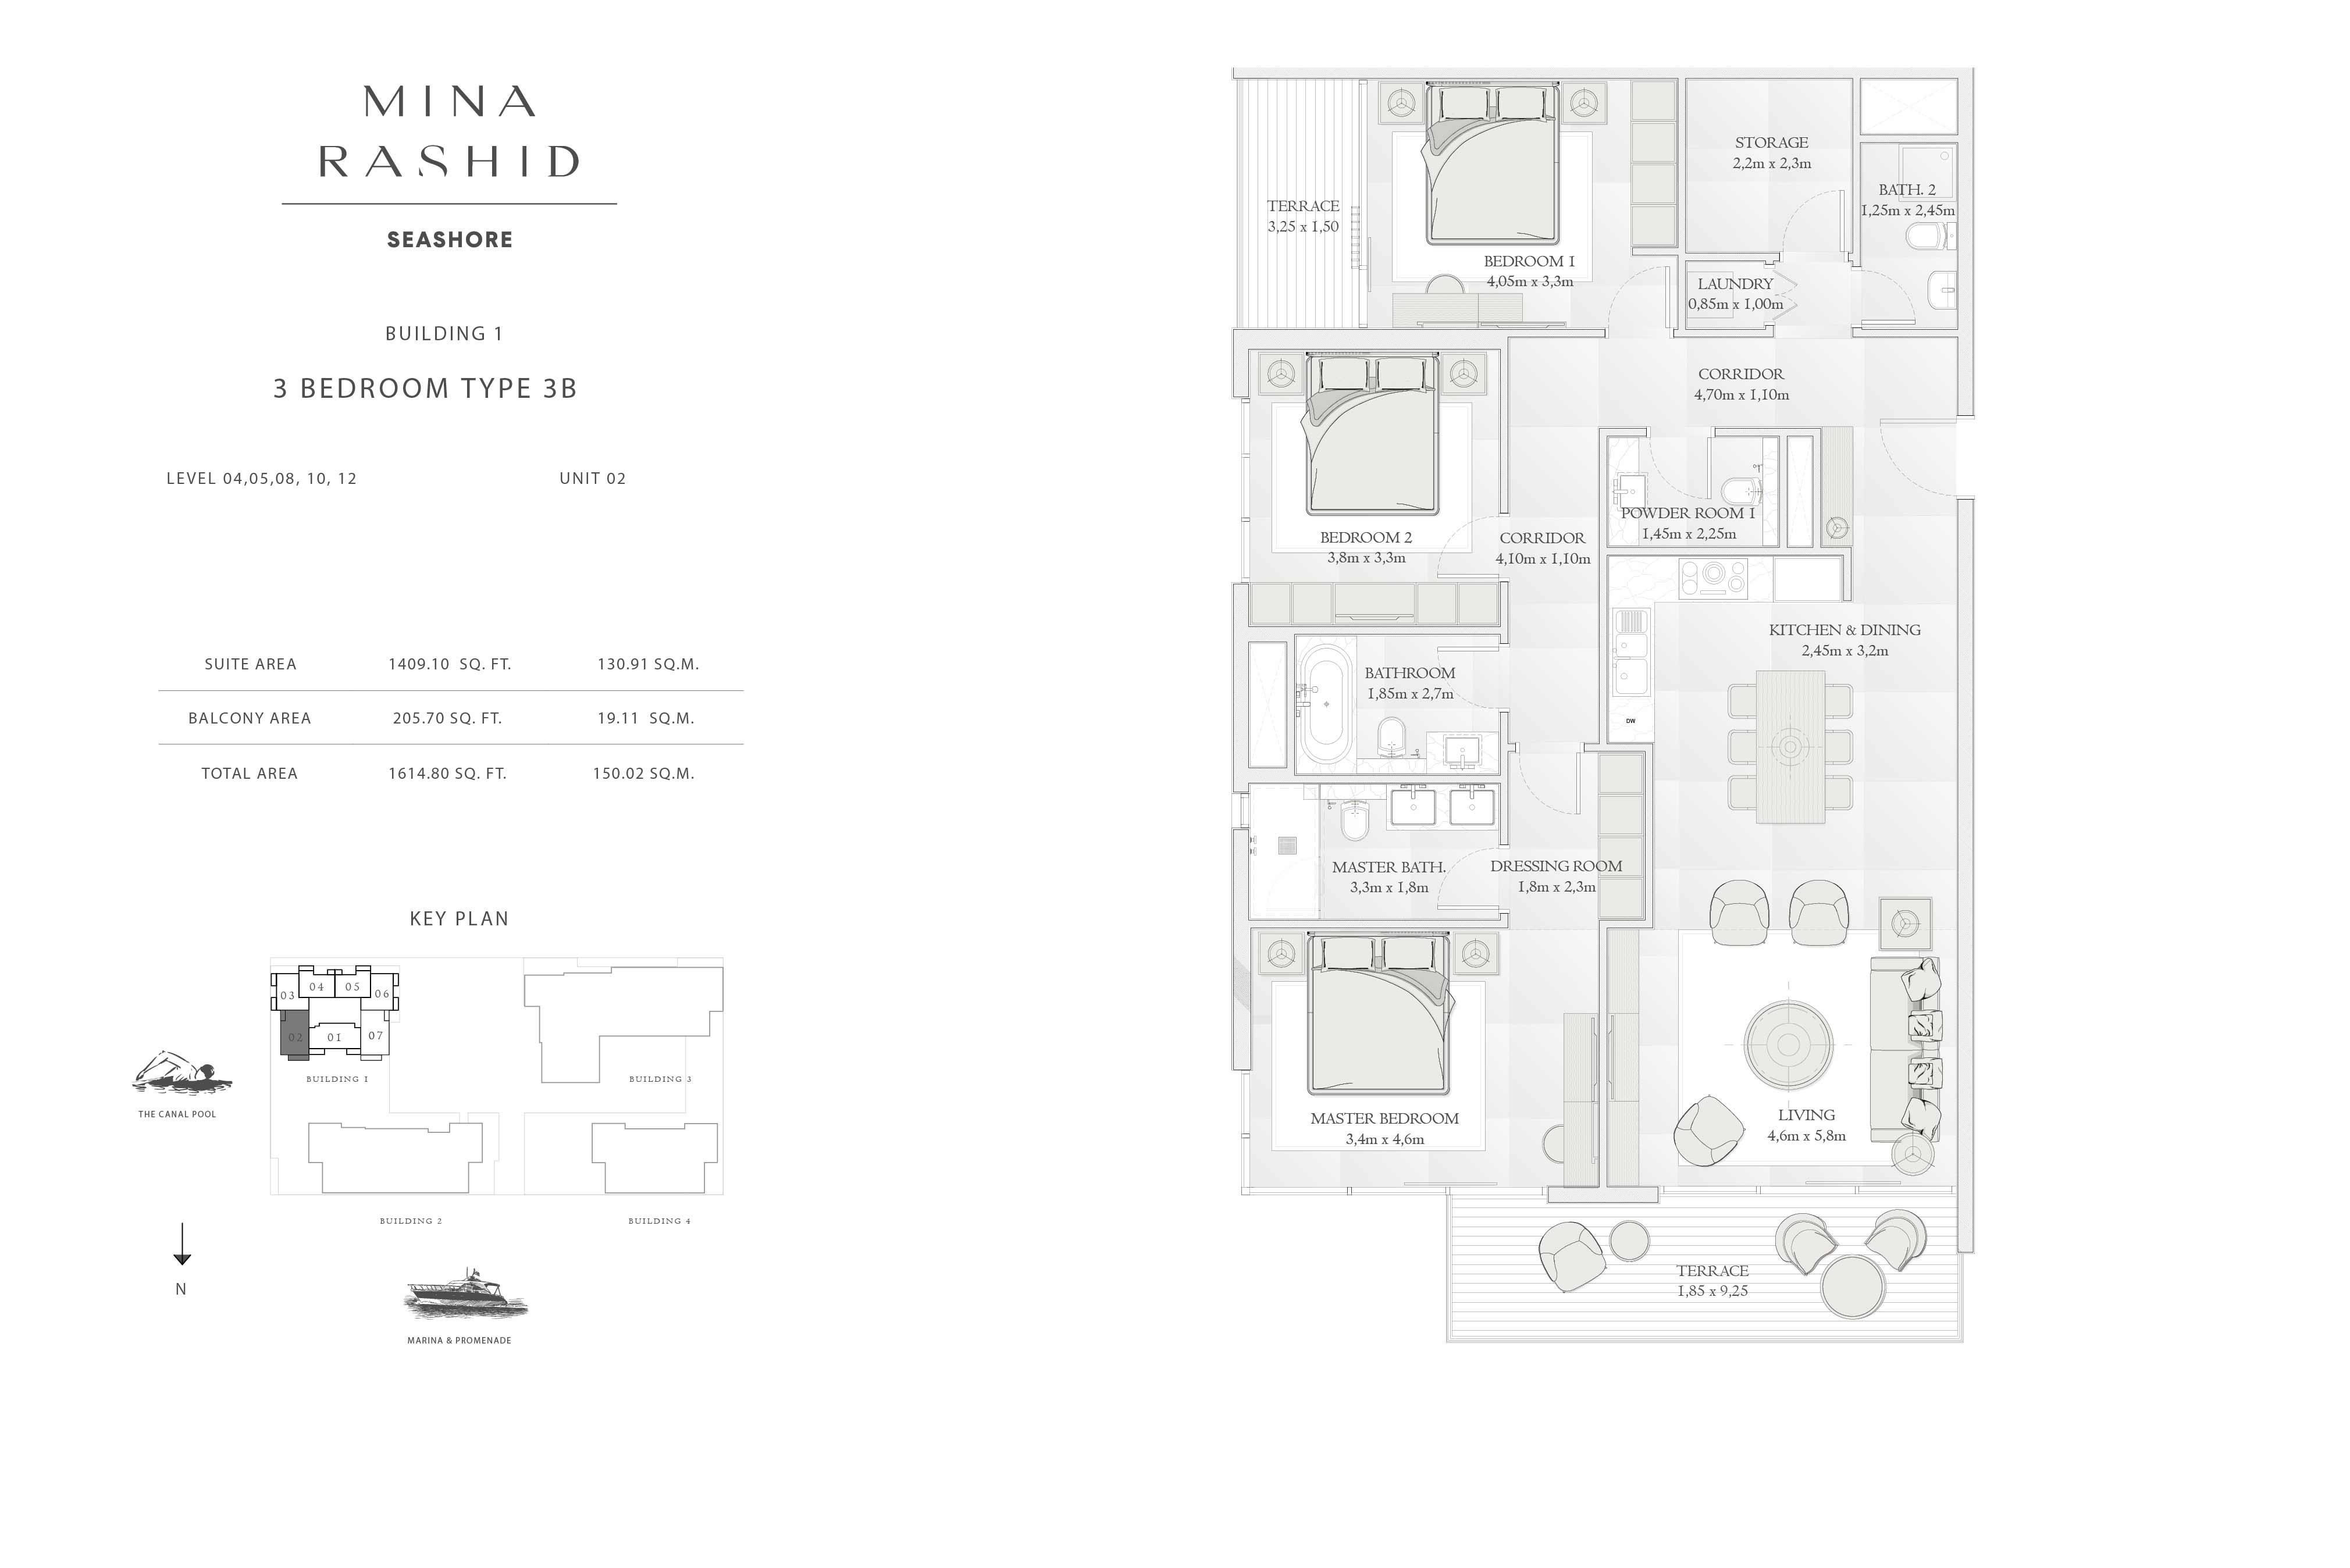 Building-1, 3-Bedroom Type-3B, Size-1614-Sq-Ft